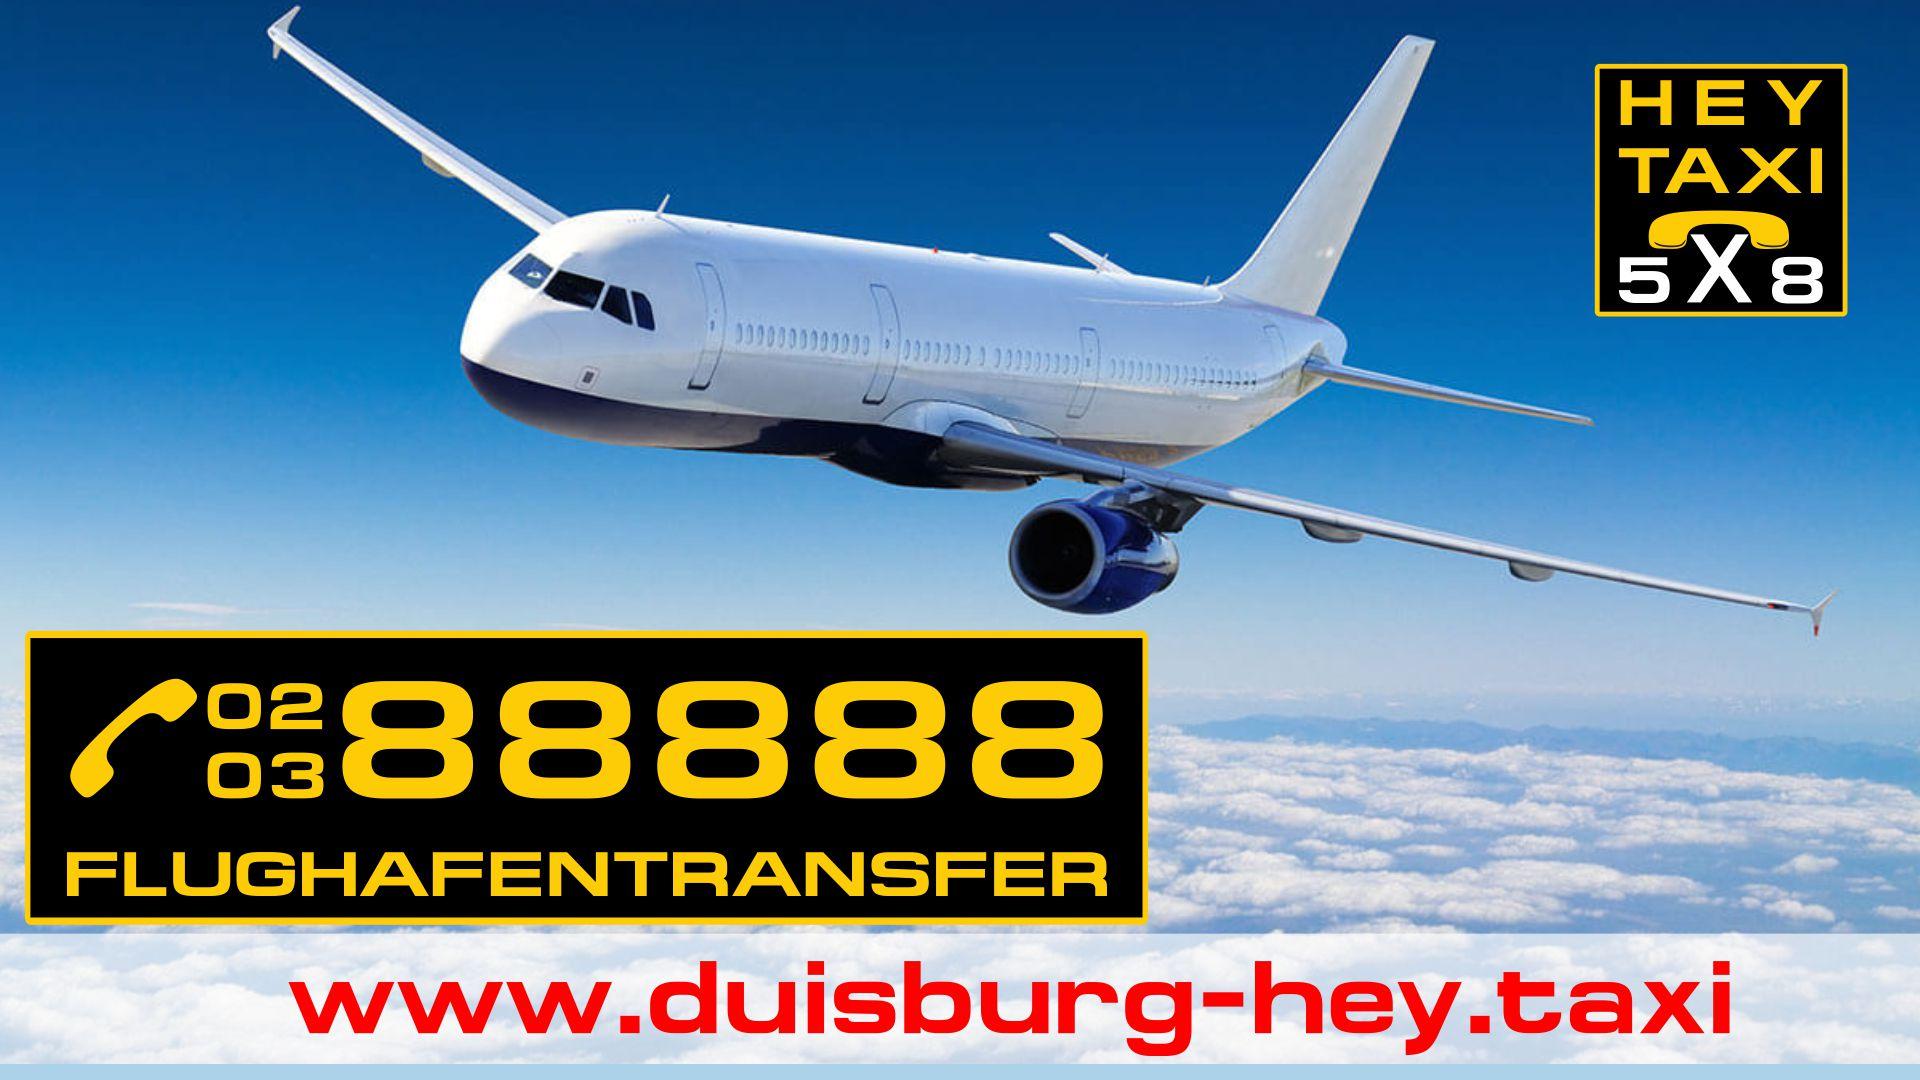 Flughafentransfer Duisburg